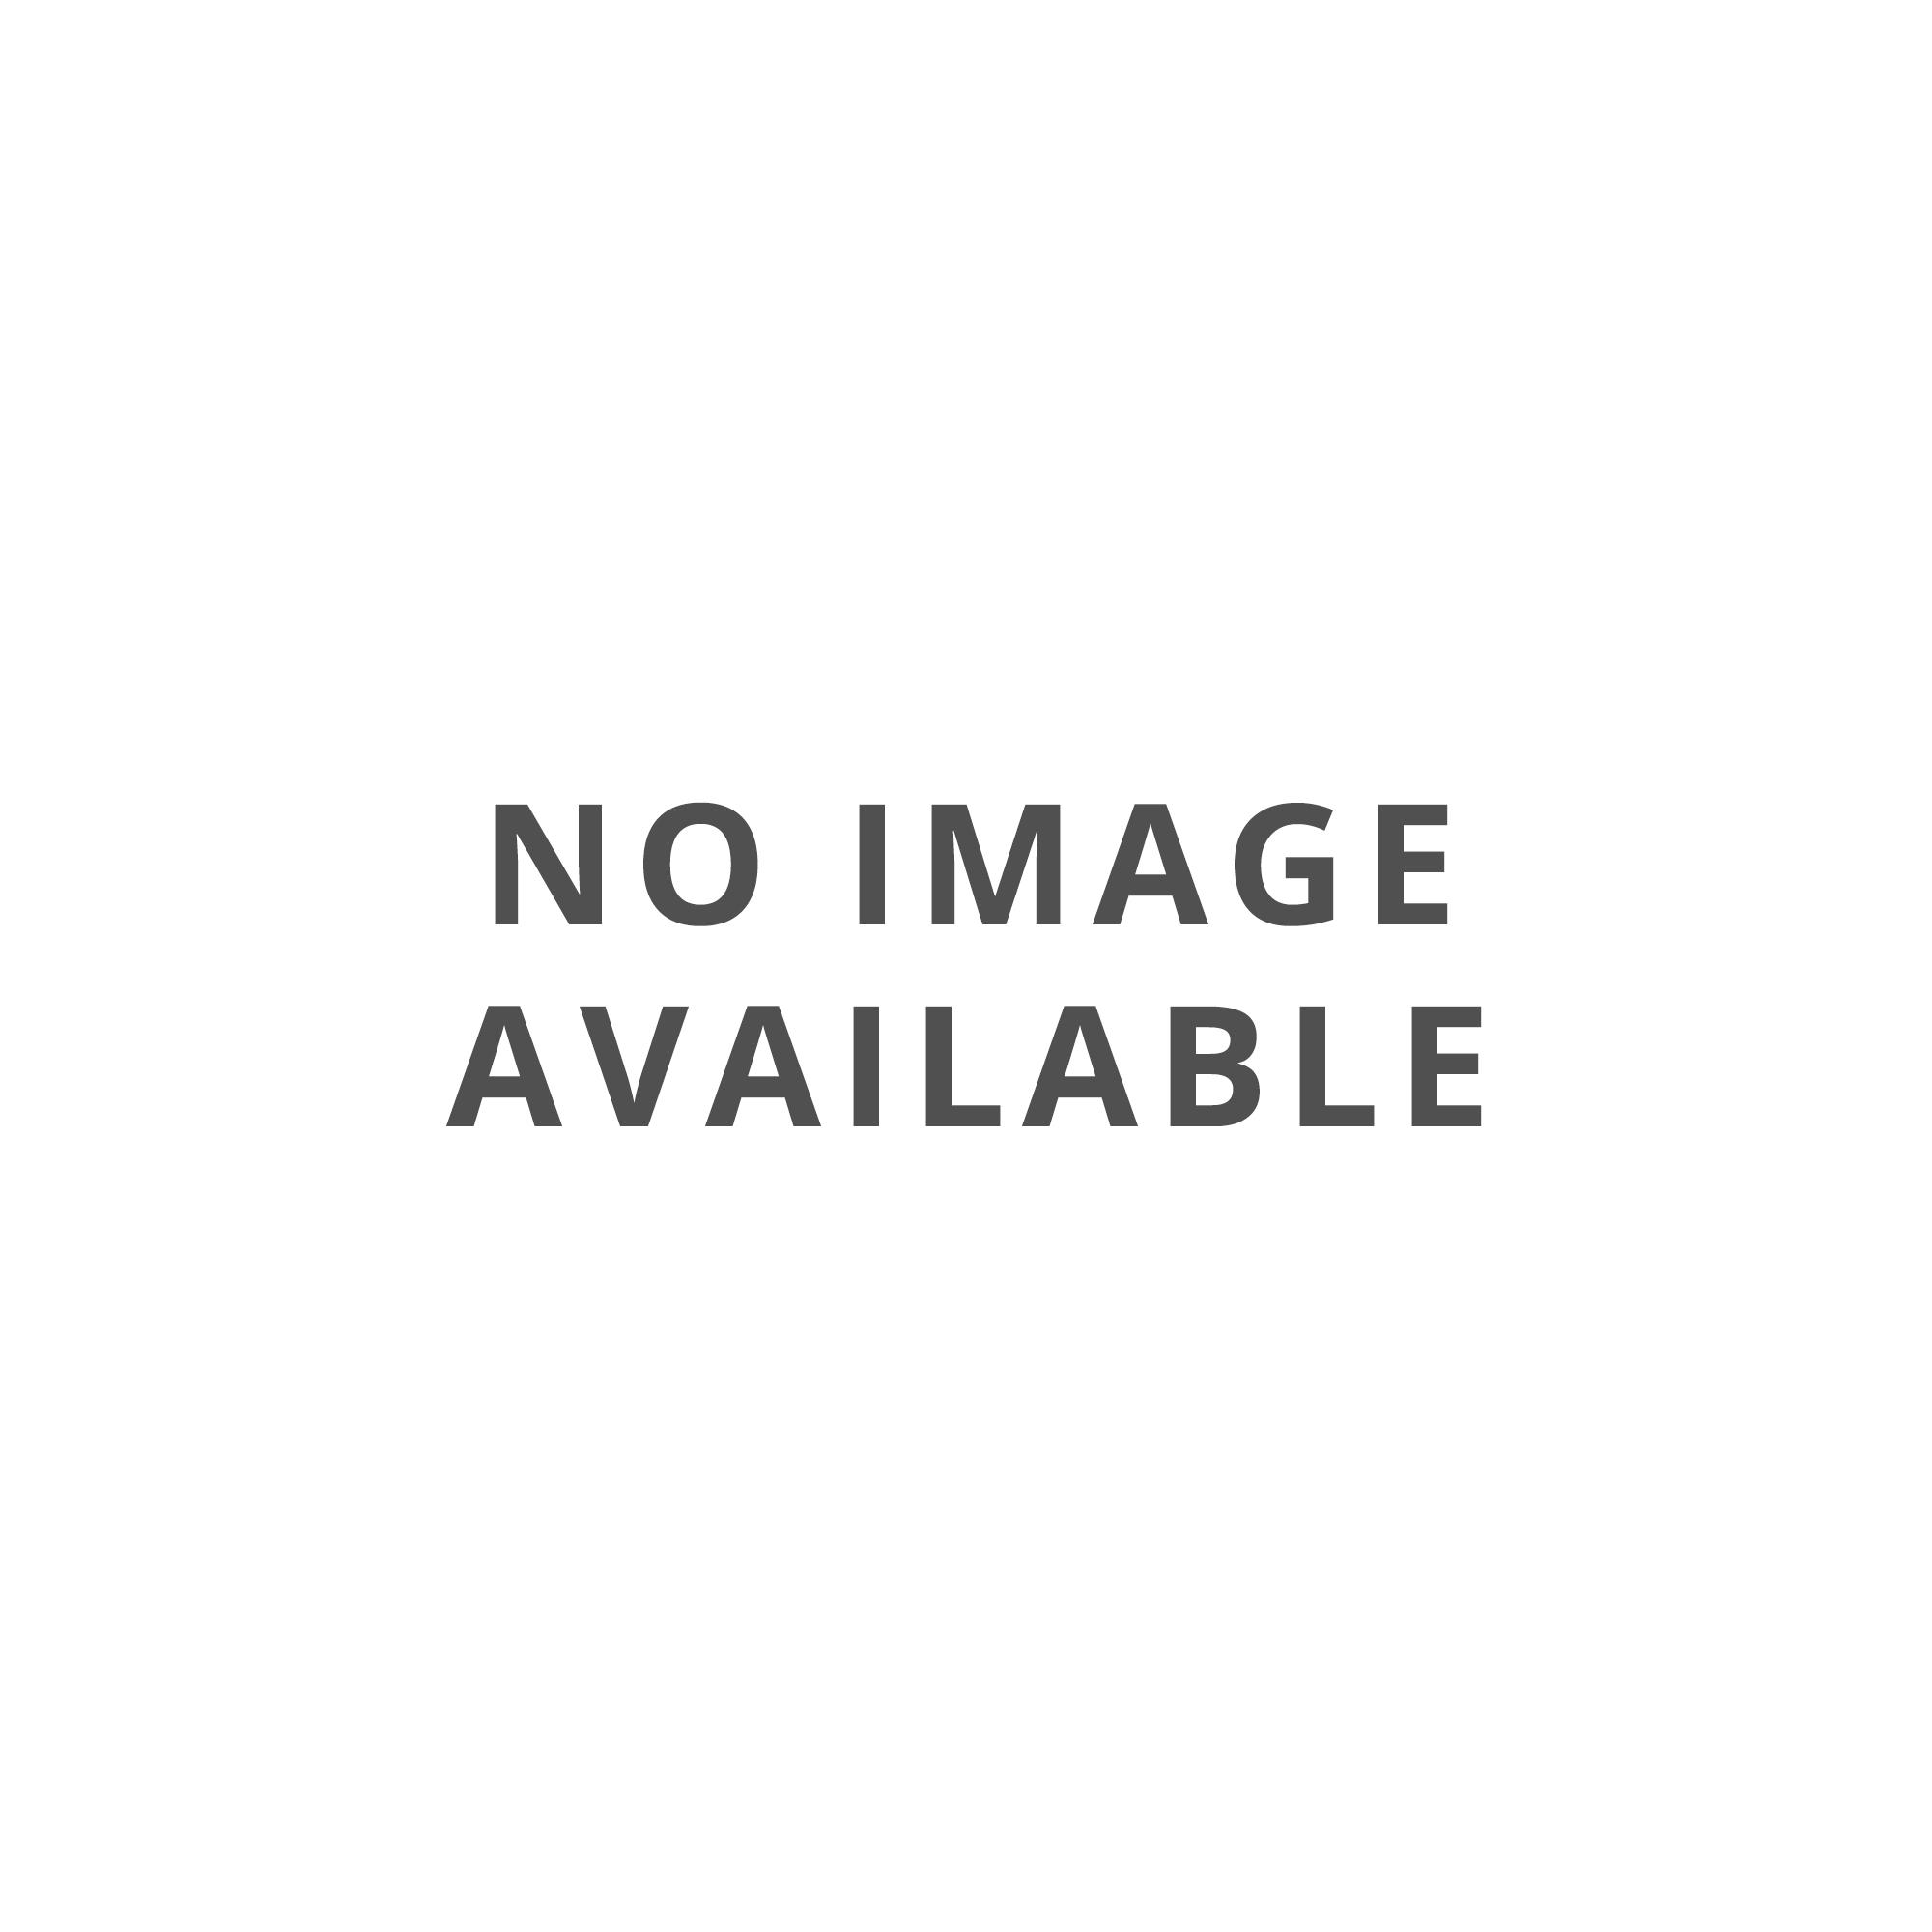 Sink Taps : Deva Lever Action Chrome Sink Taps DLV103 - Deva from TAPS UK